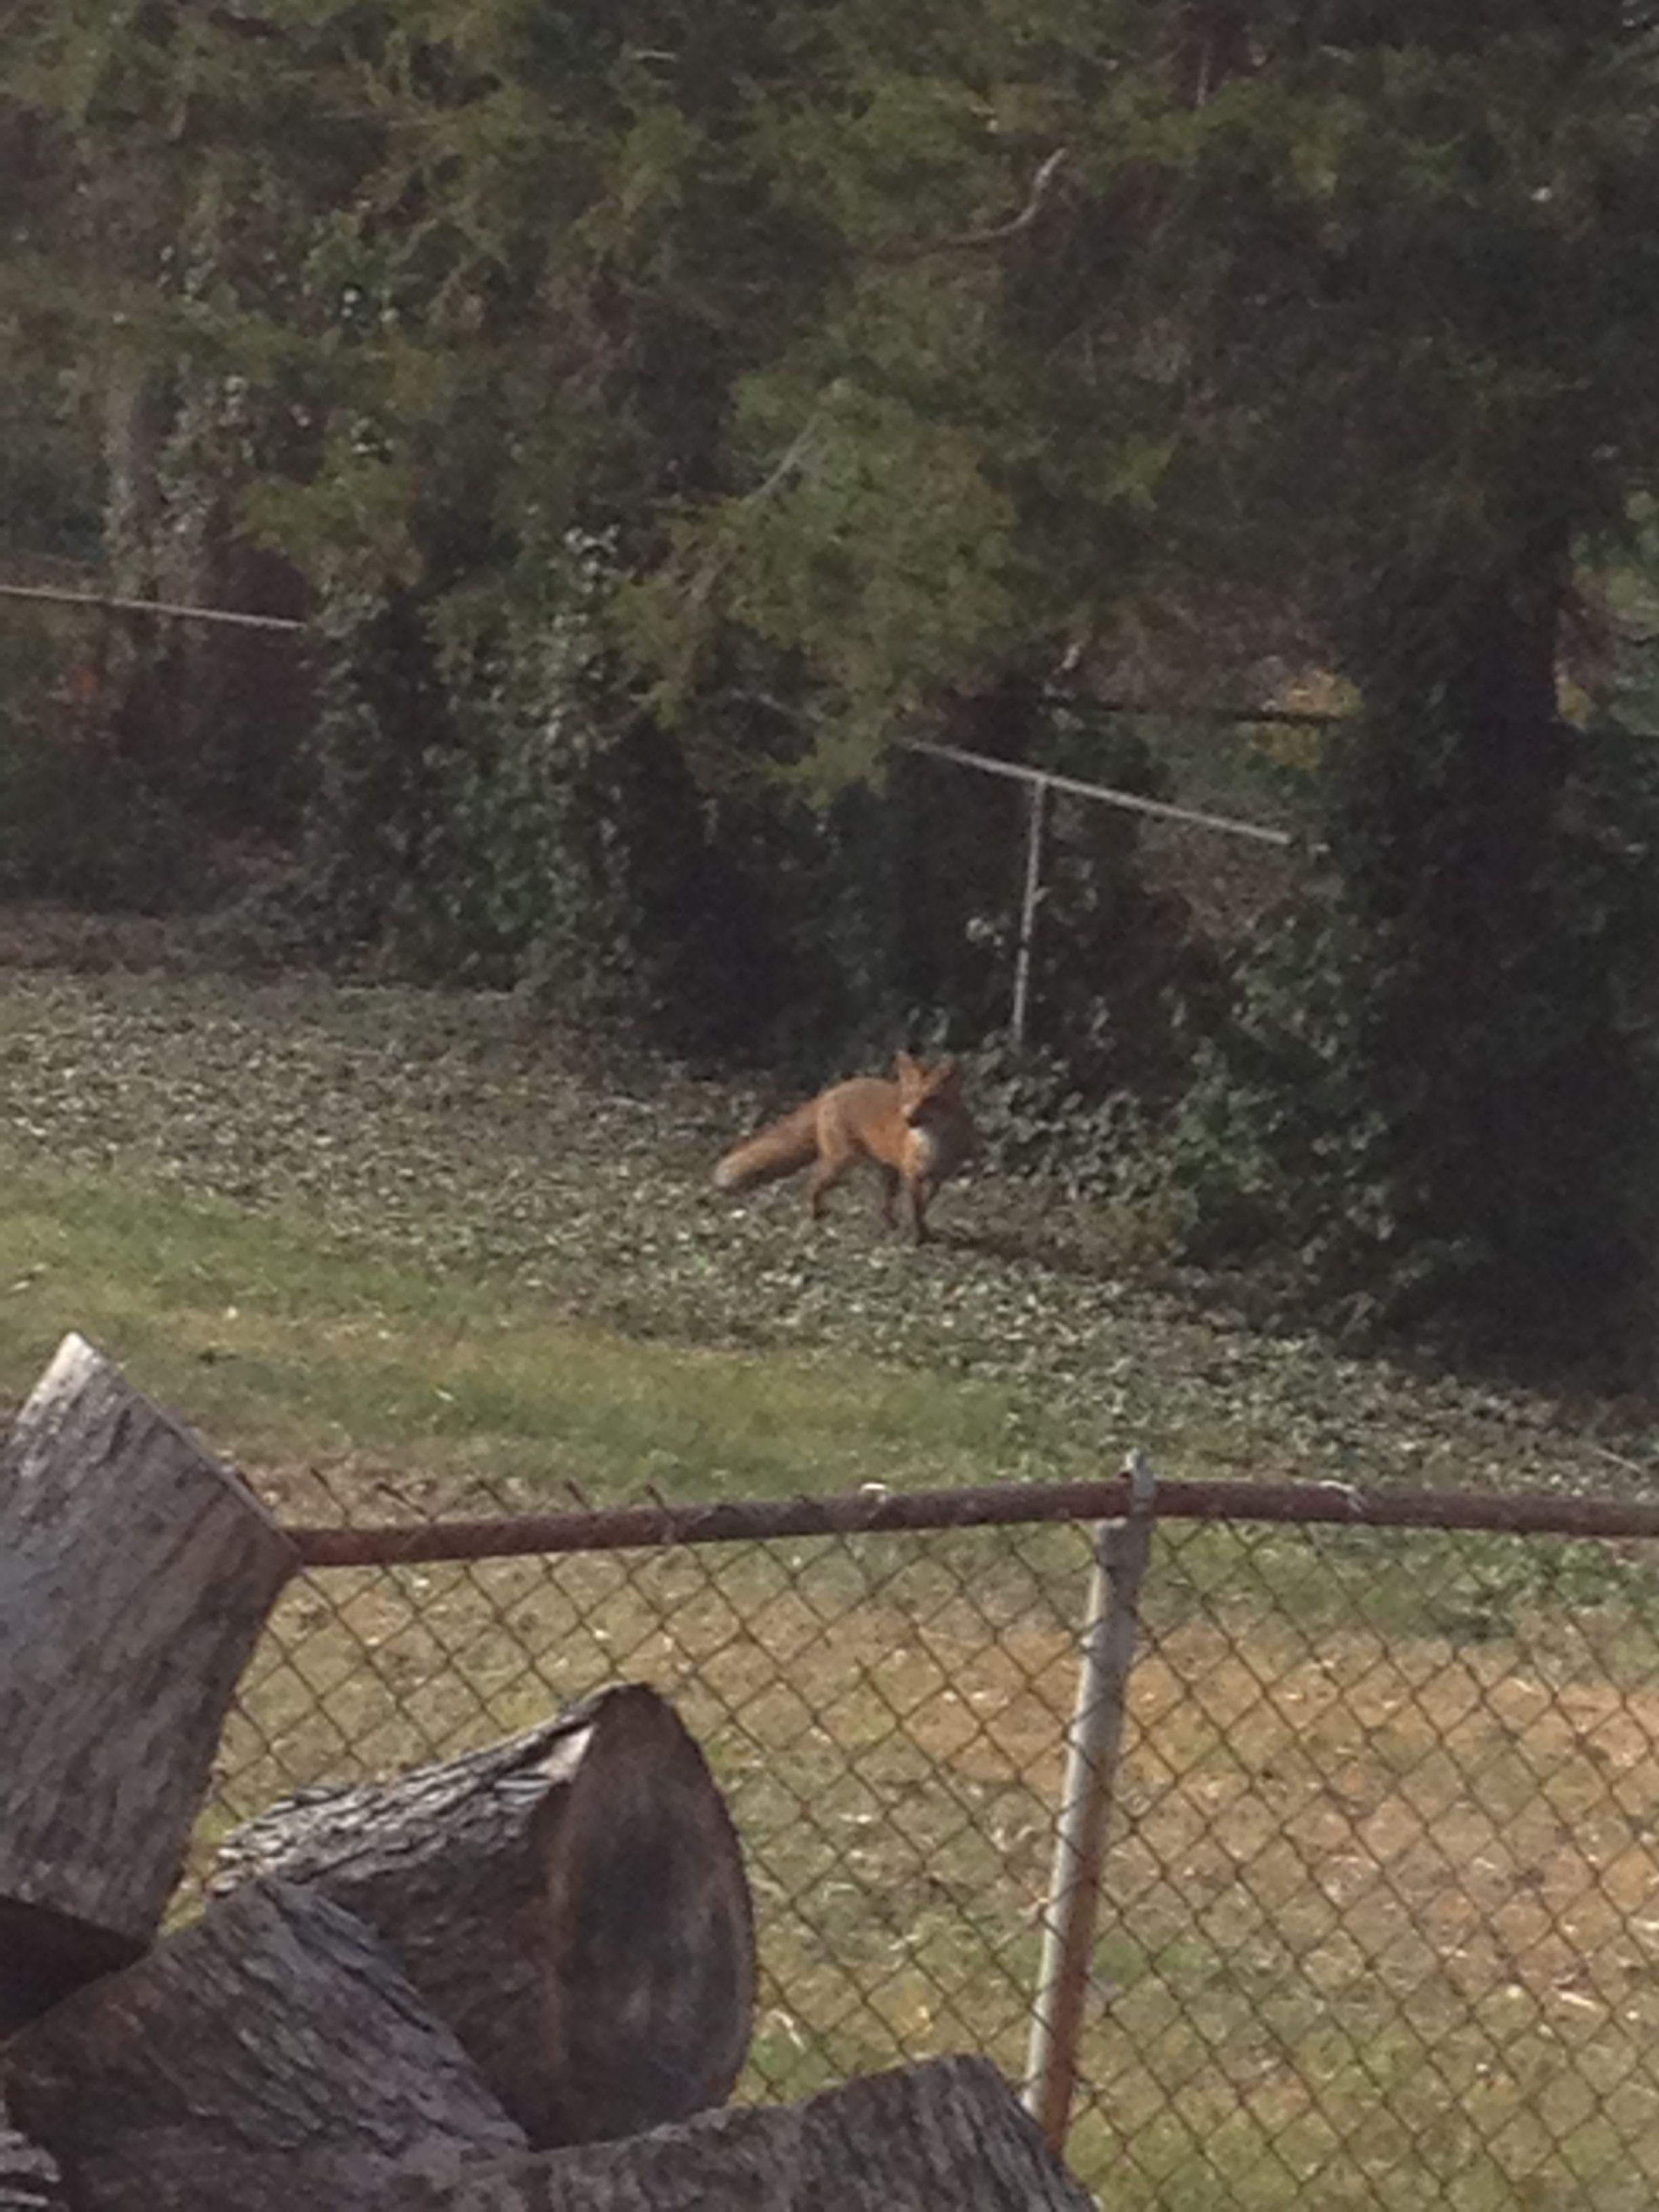 Fox in my yard (With images) | Animals, Yard, Fox